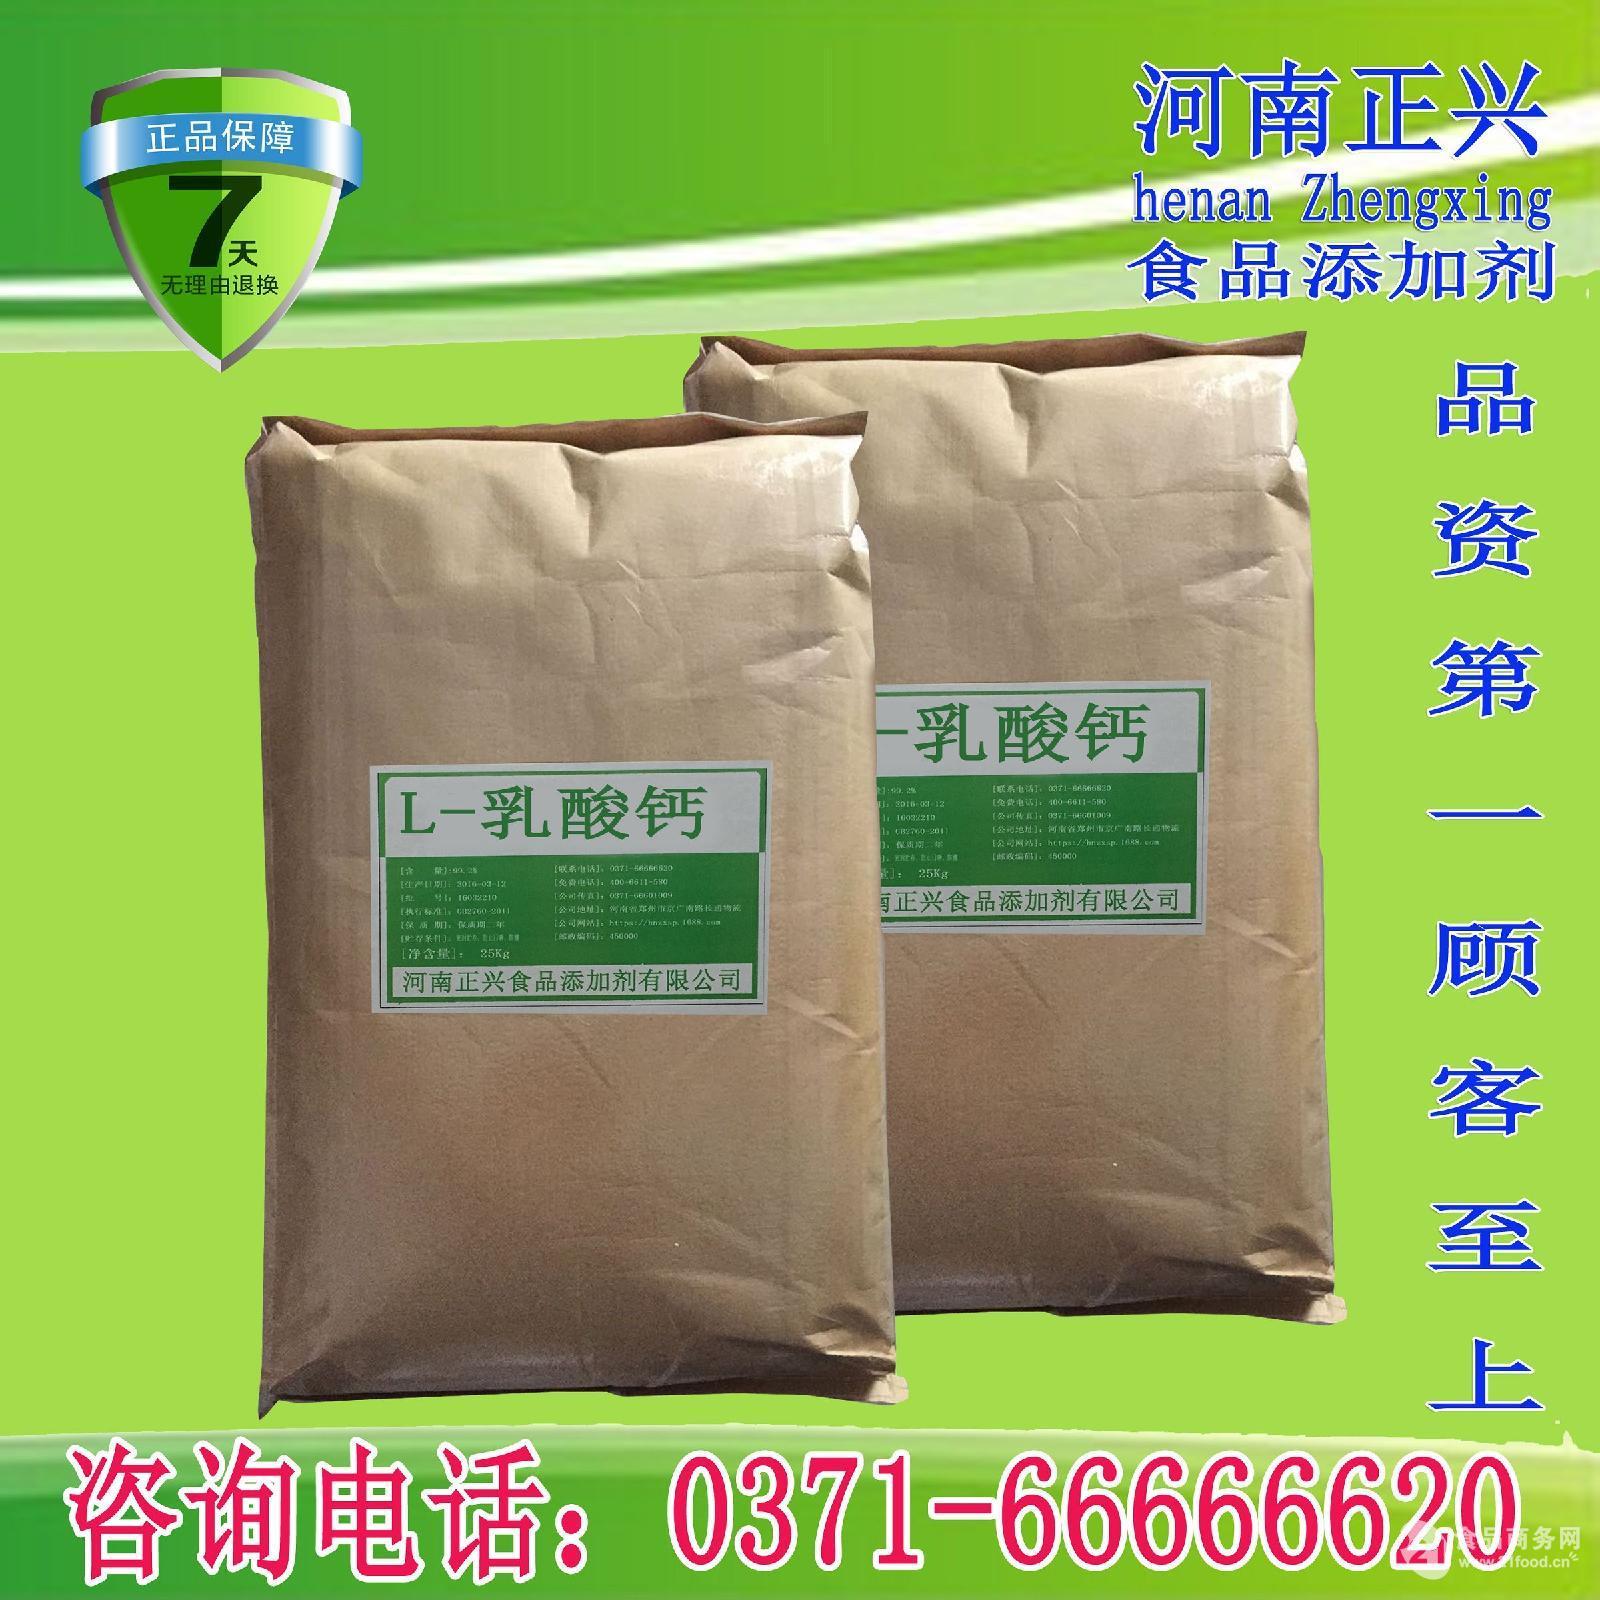 L-乳酸钙 乳酸钙